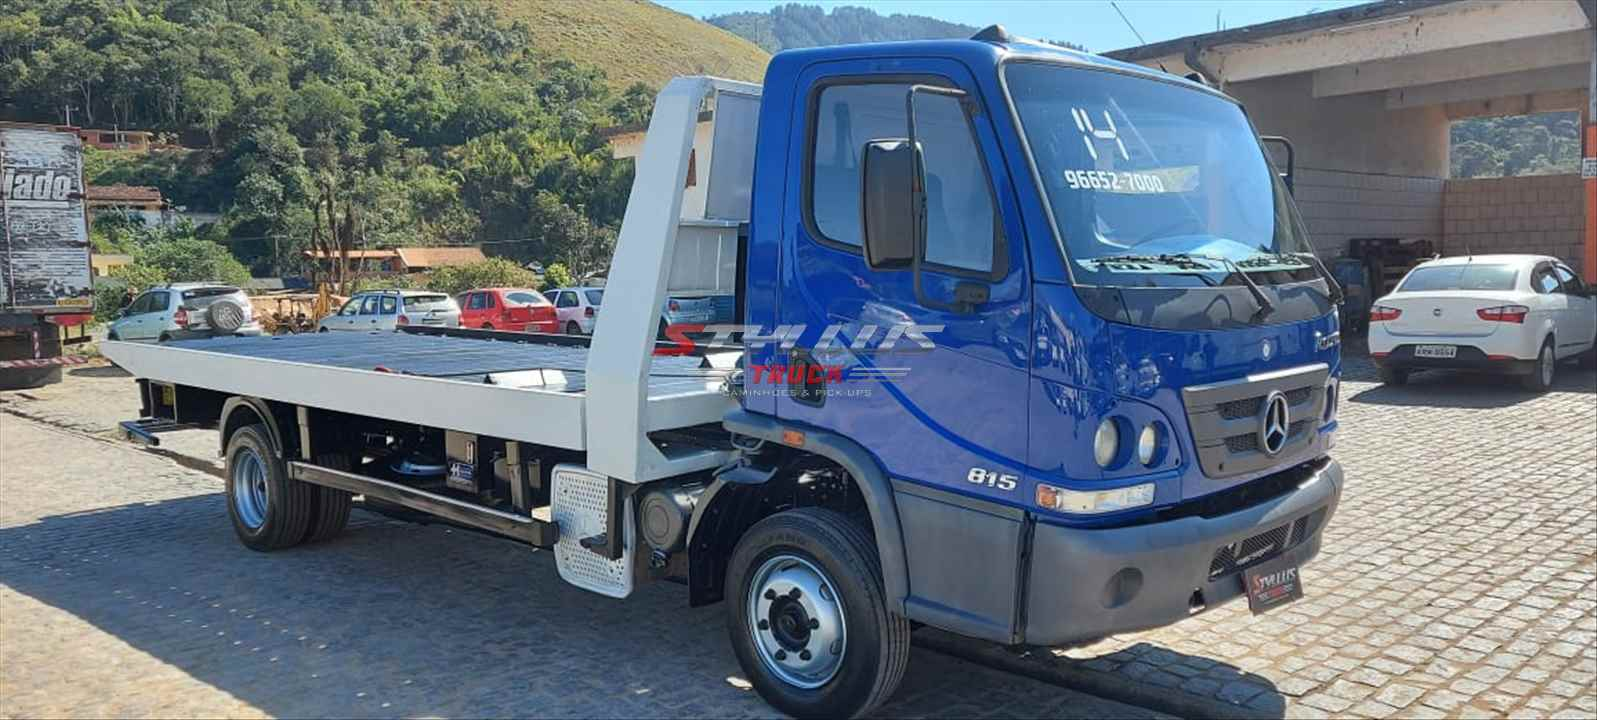 CAMINHAO MERCEDES-BENZ MB 815 Plataforma Guincho 3/4 4x2 Styllus Truck TERESOPOLIS RIO DE JANEIRO RJ